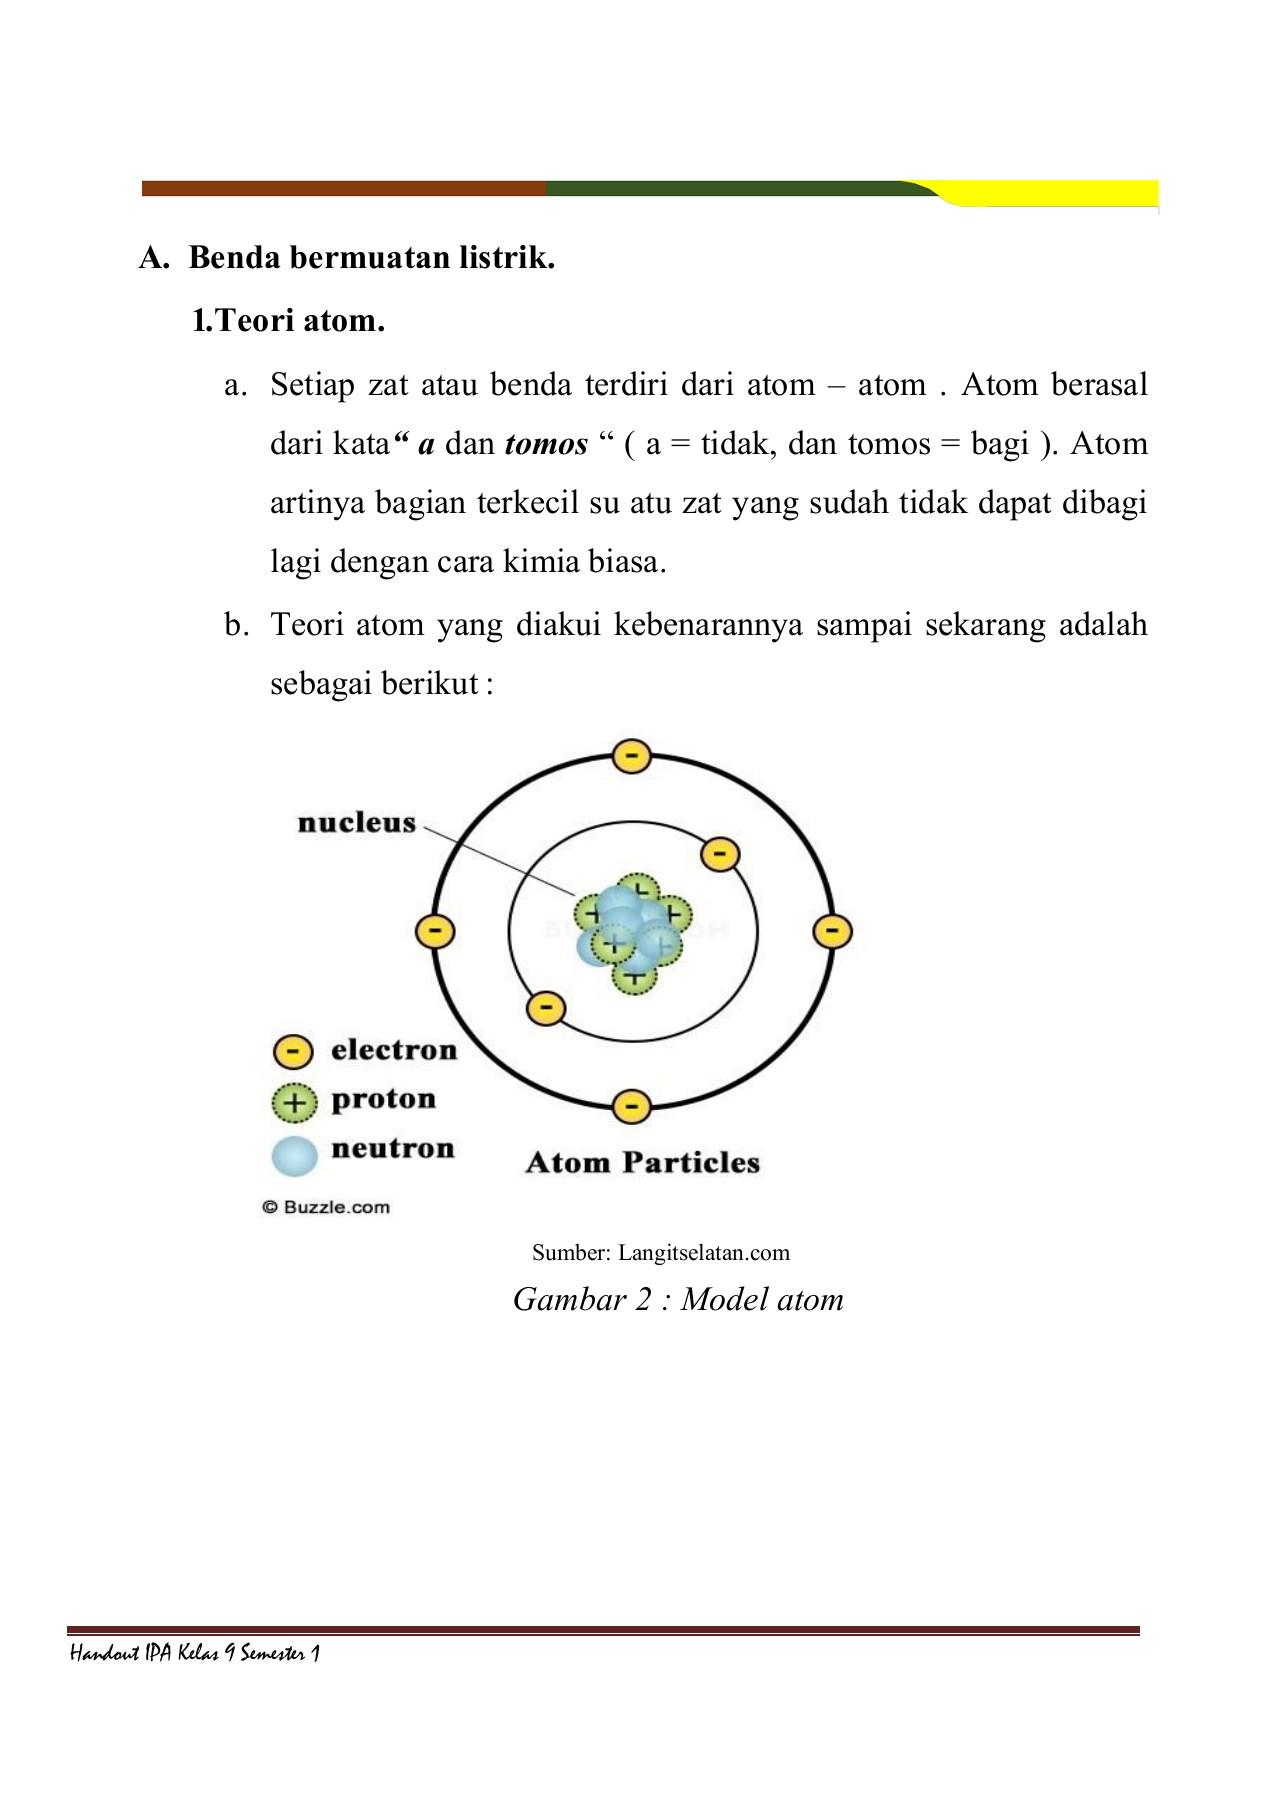 Cara Membuat Benda Bermuatan Listrik : membuat, benda, bermuatan, listrik, Tidak, Bermuatan, Listrik, Python